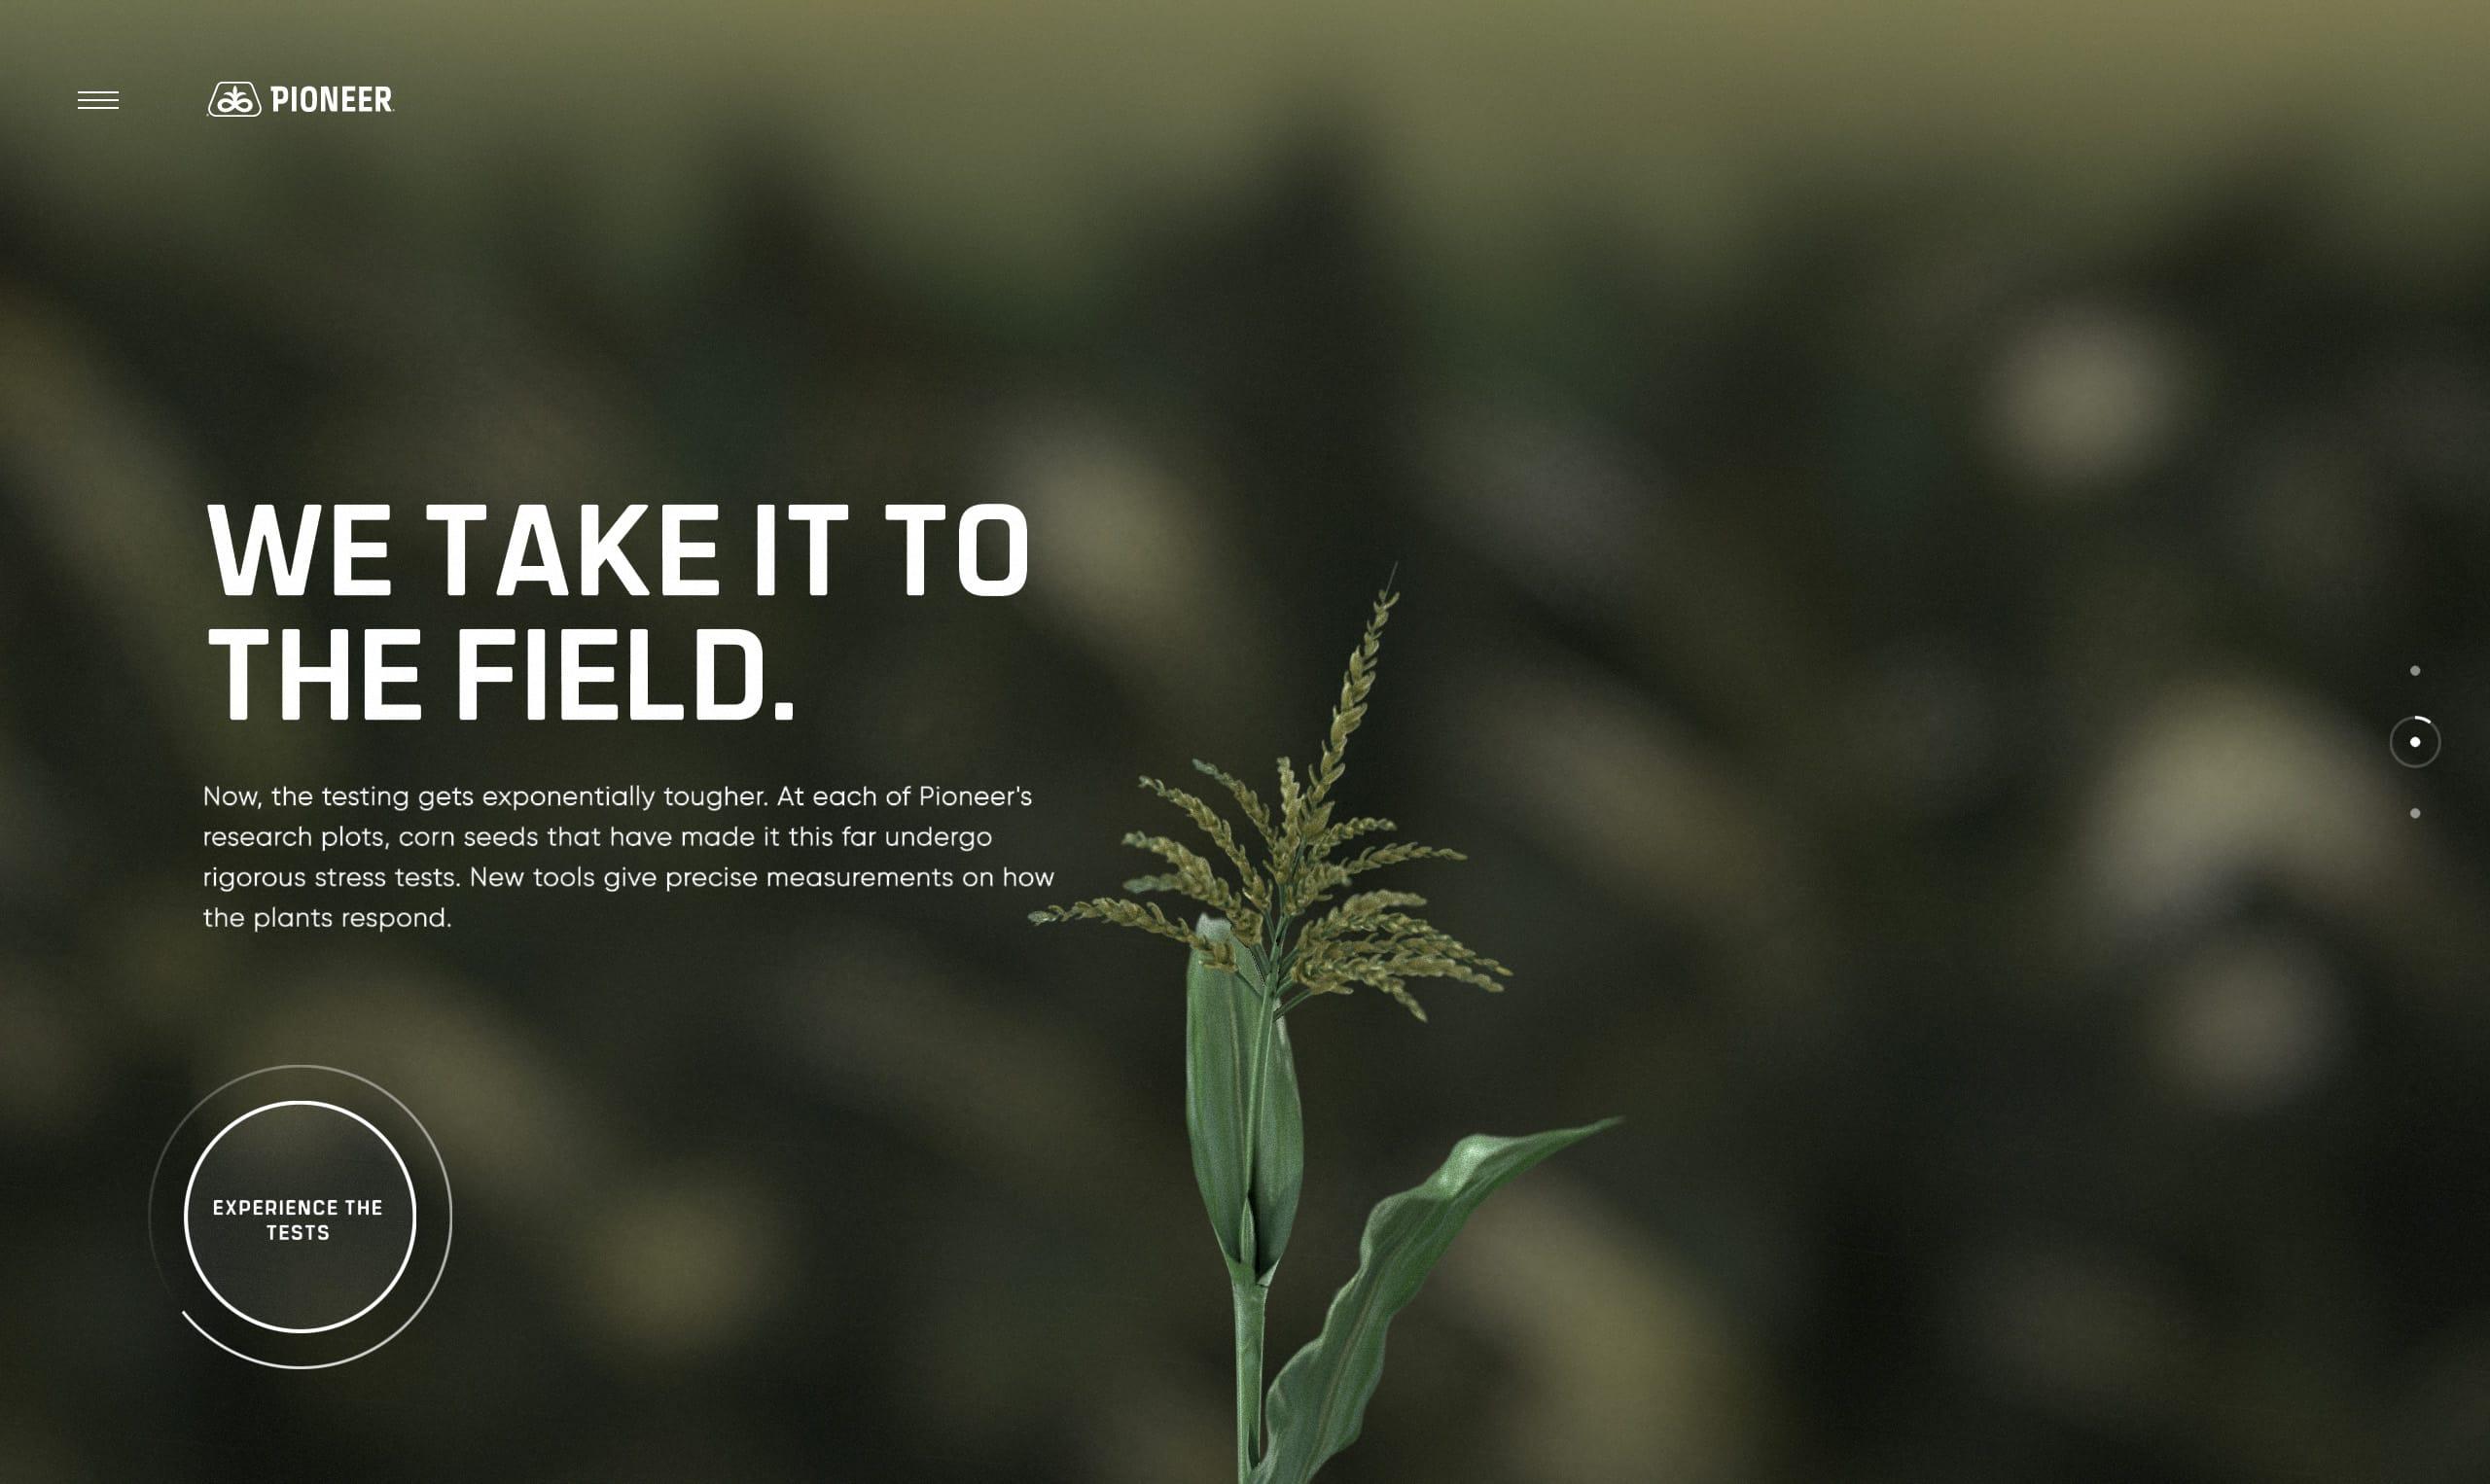 Pioneer Website Screenshot